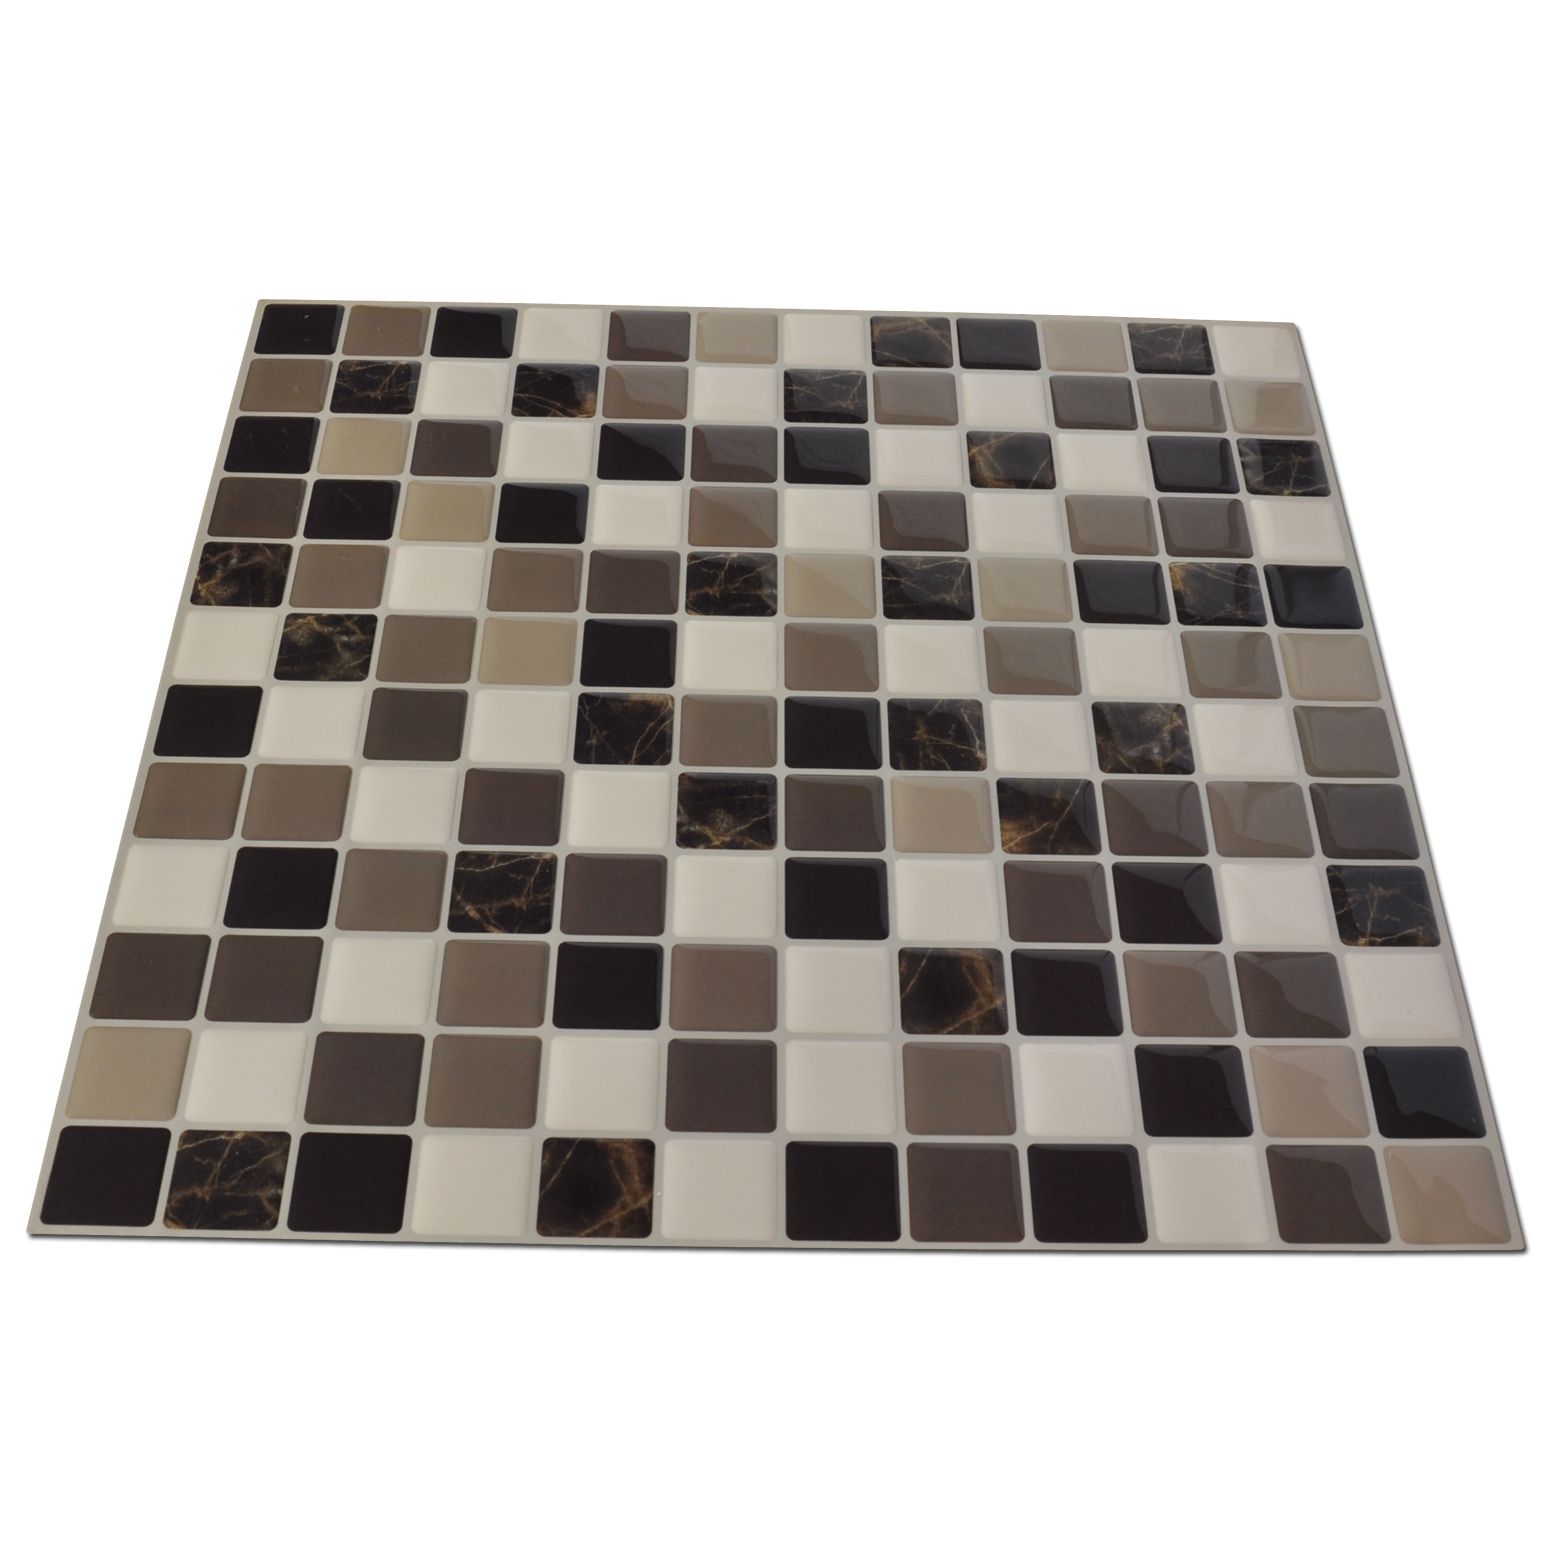 Backsplash tile adhesive